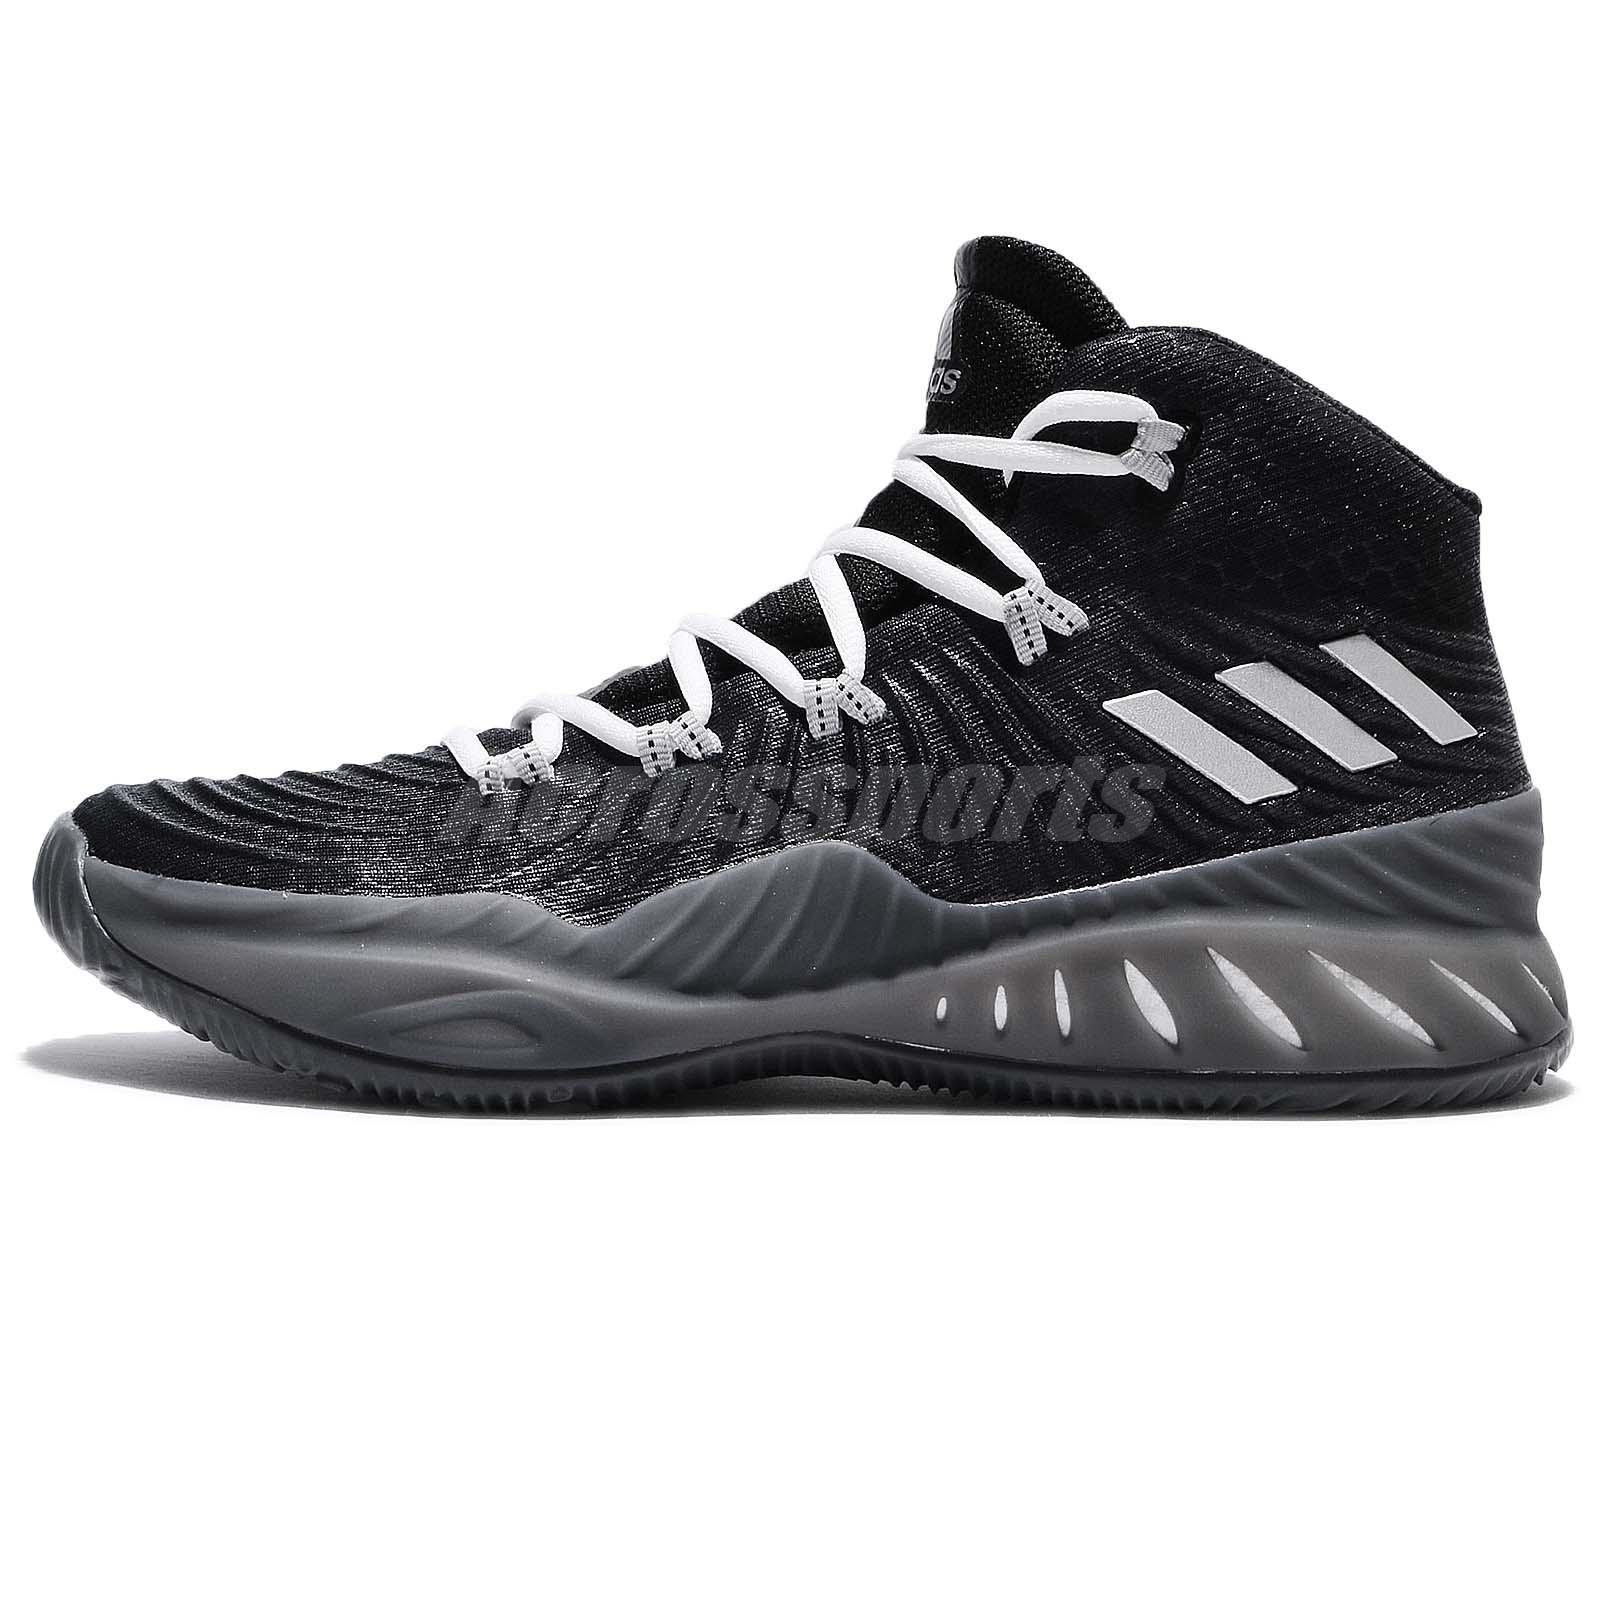 Custom Made Adidas Basketball Shoes